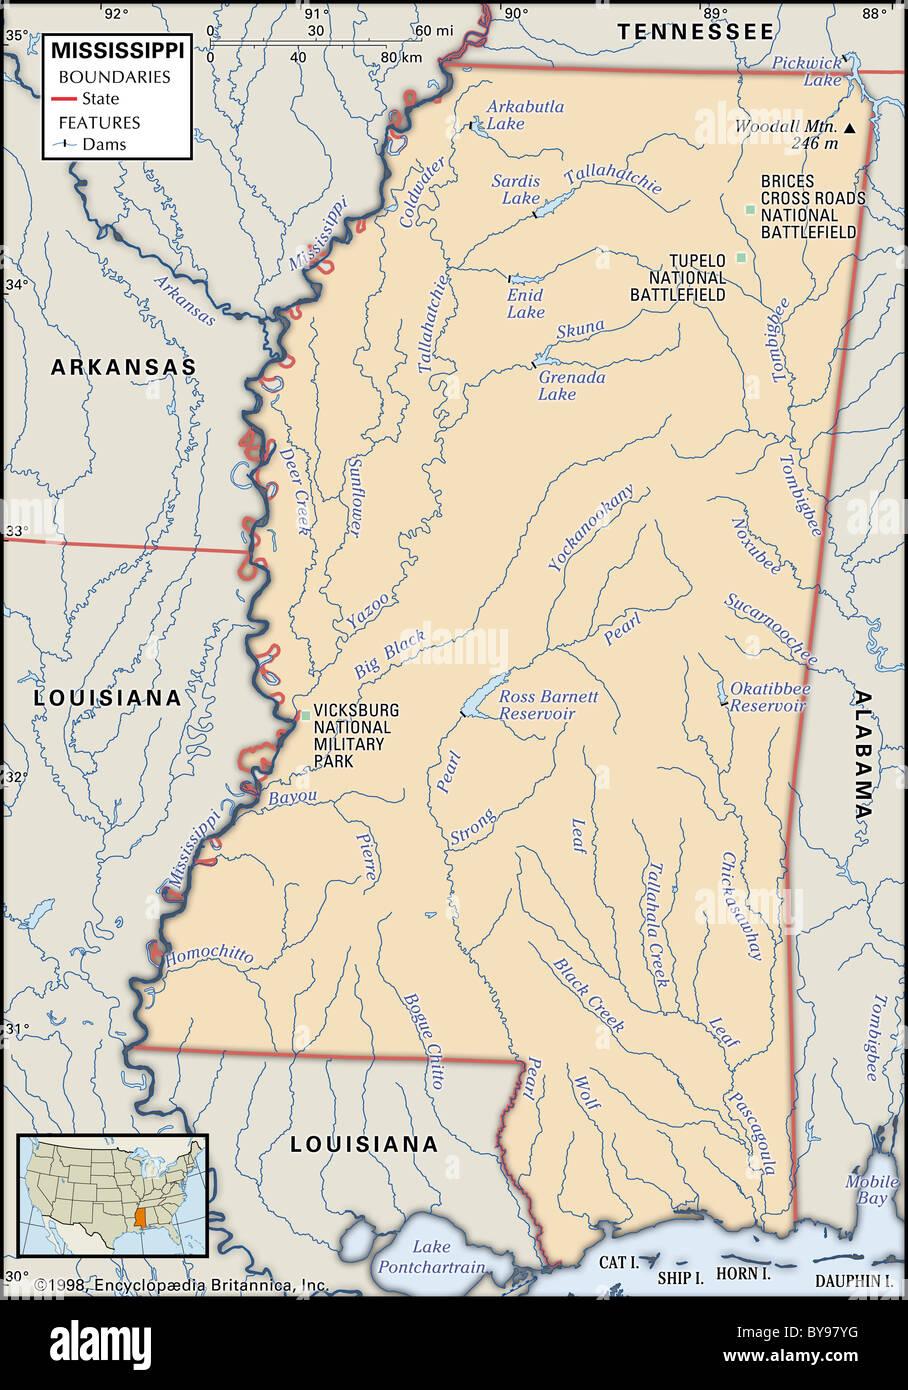 Physical map of Mississippi Stock Photo: 34009908 - Alamy on north carolina map, usa map, tn map, ohio map, illinois map, virgina map, mississippi map, nc map, alabama map, texas map, sc map, michigan map, georgia map, kentucky map, nashville map, missouri map, south carolina map, florida map, arkansas map, tennessee map,